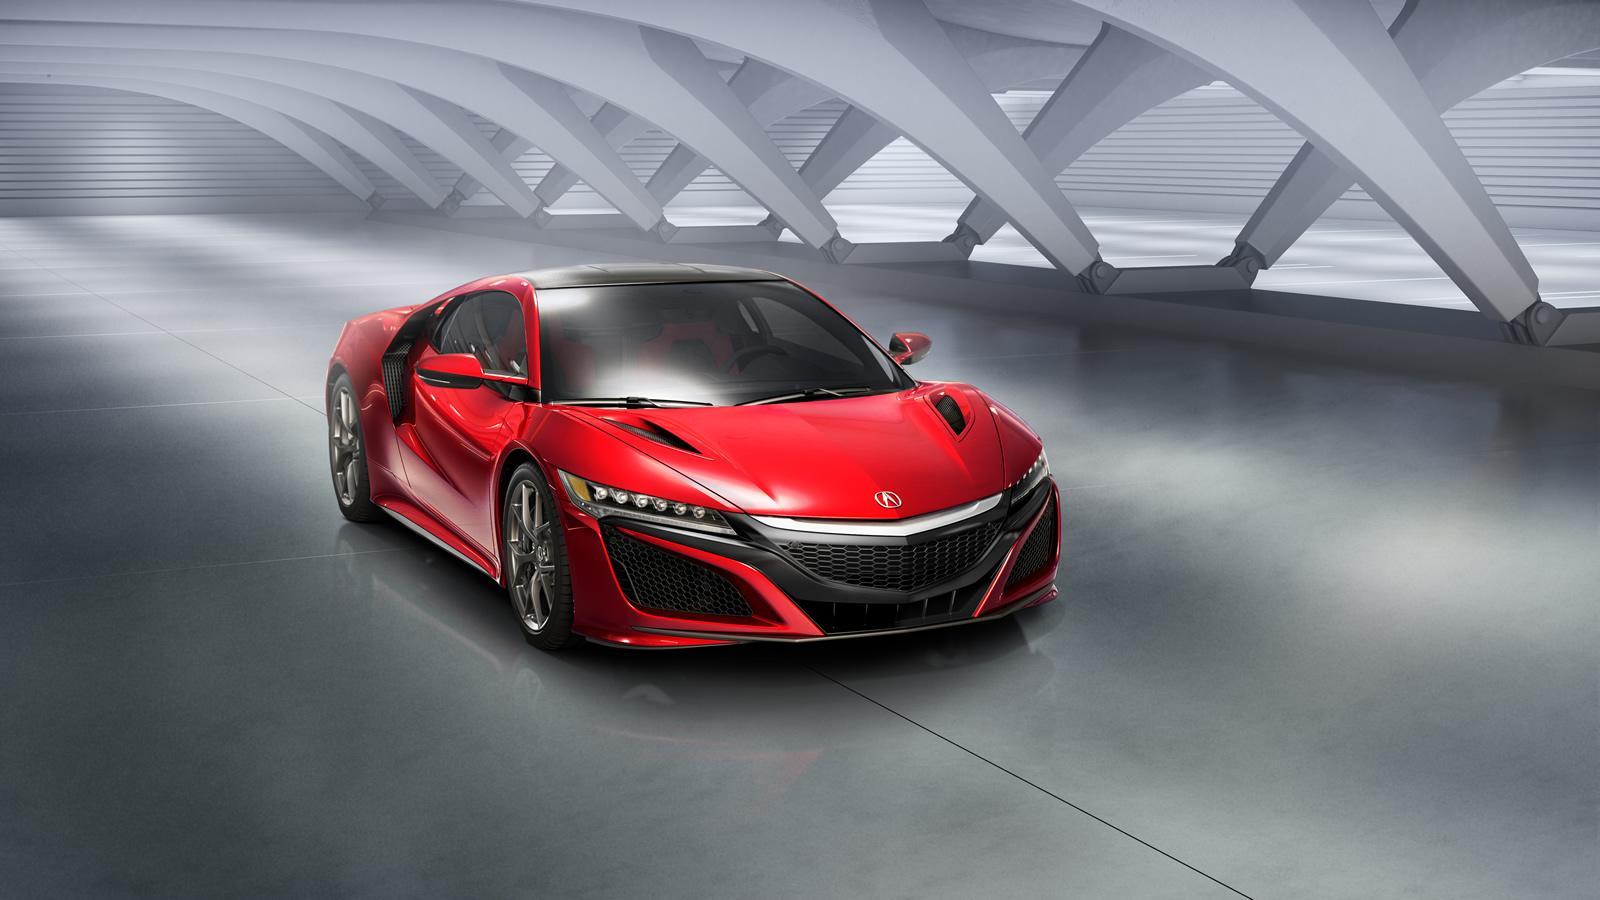 Upcoming 2017 Cars - Acura NSX